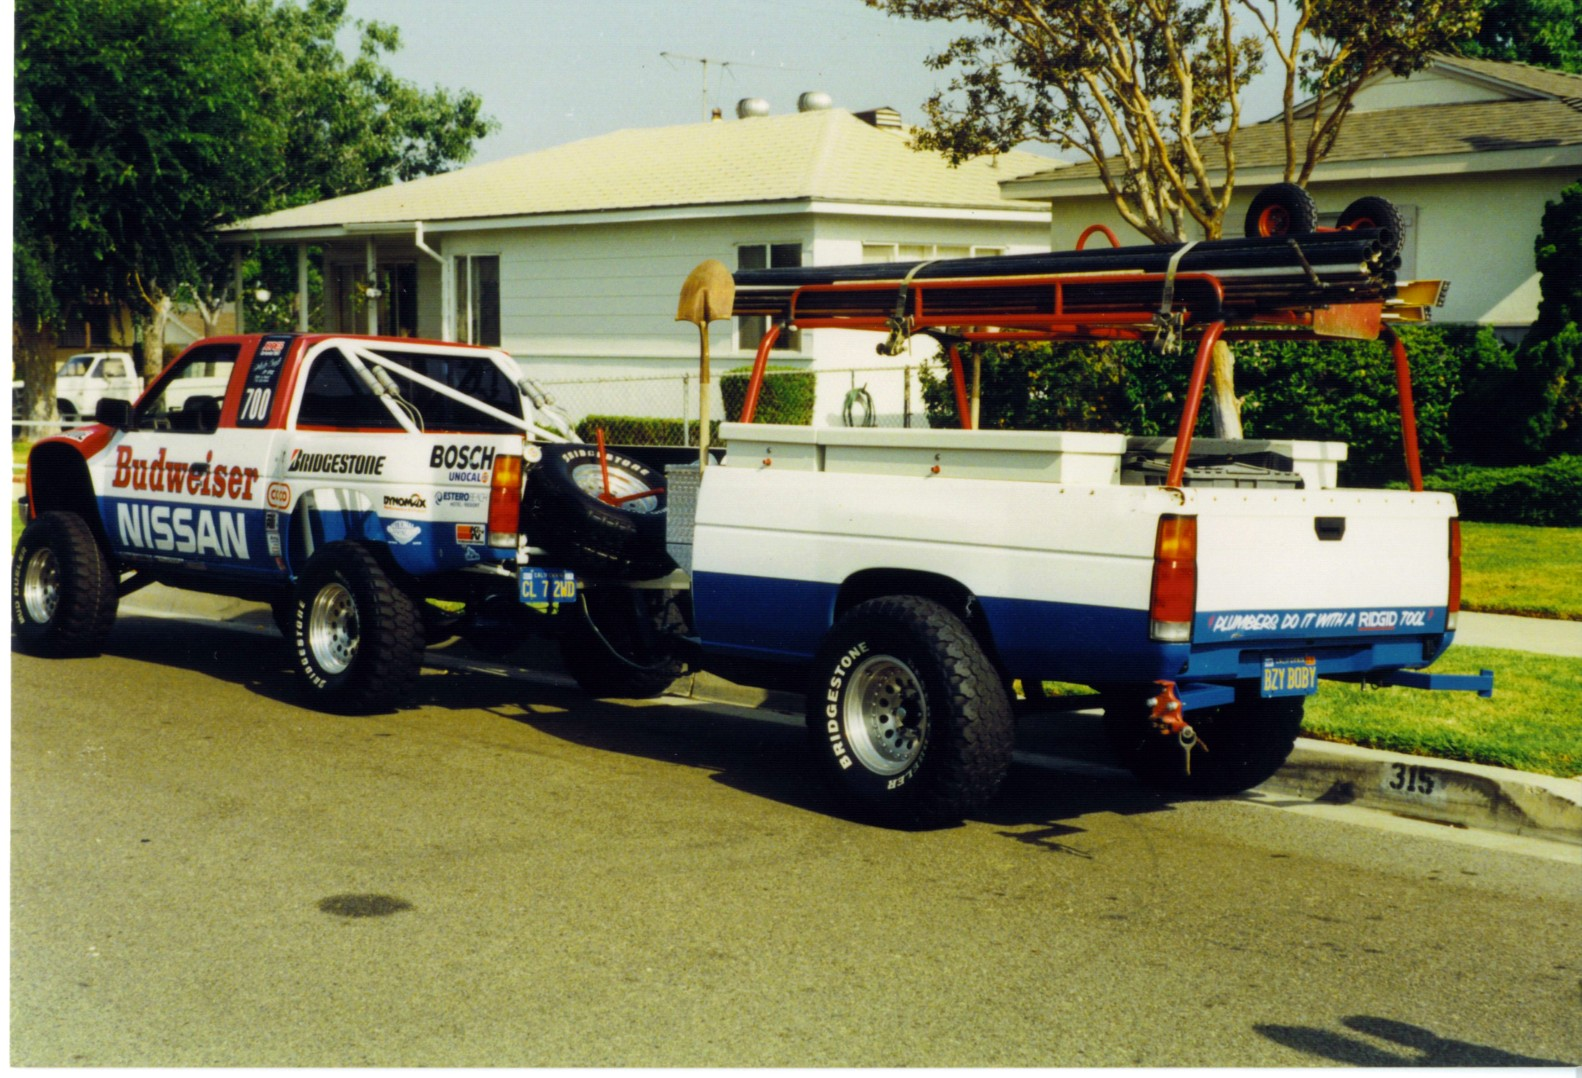 ... Nissan Hardbody Pickup Engine Compatibility-work-truck-edit.jpg ' ...